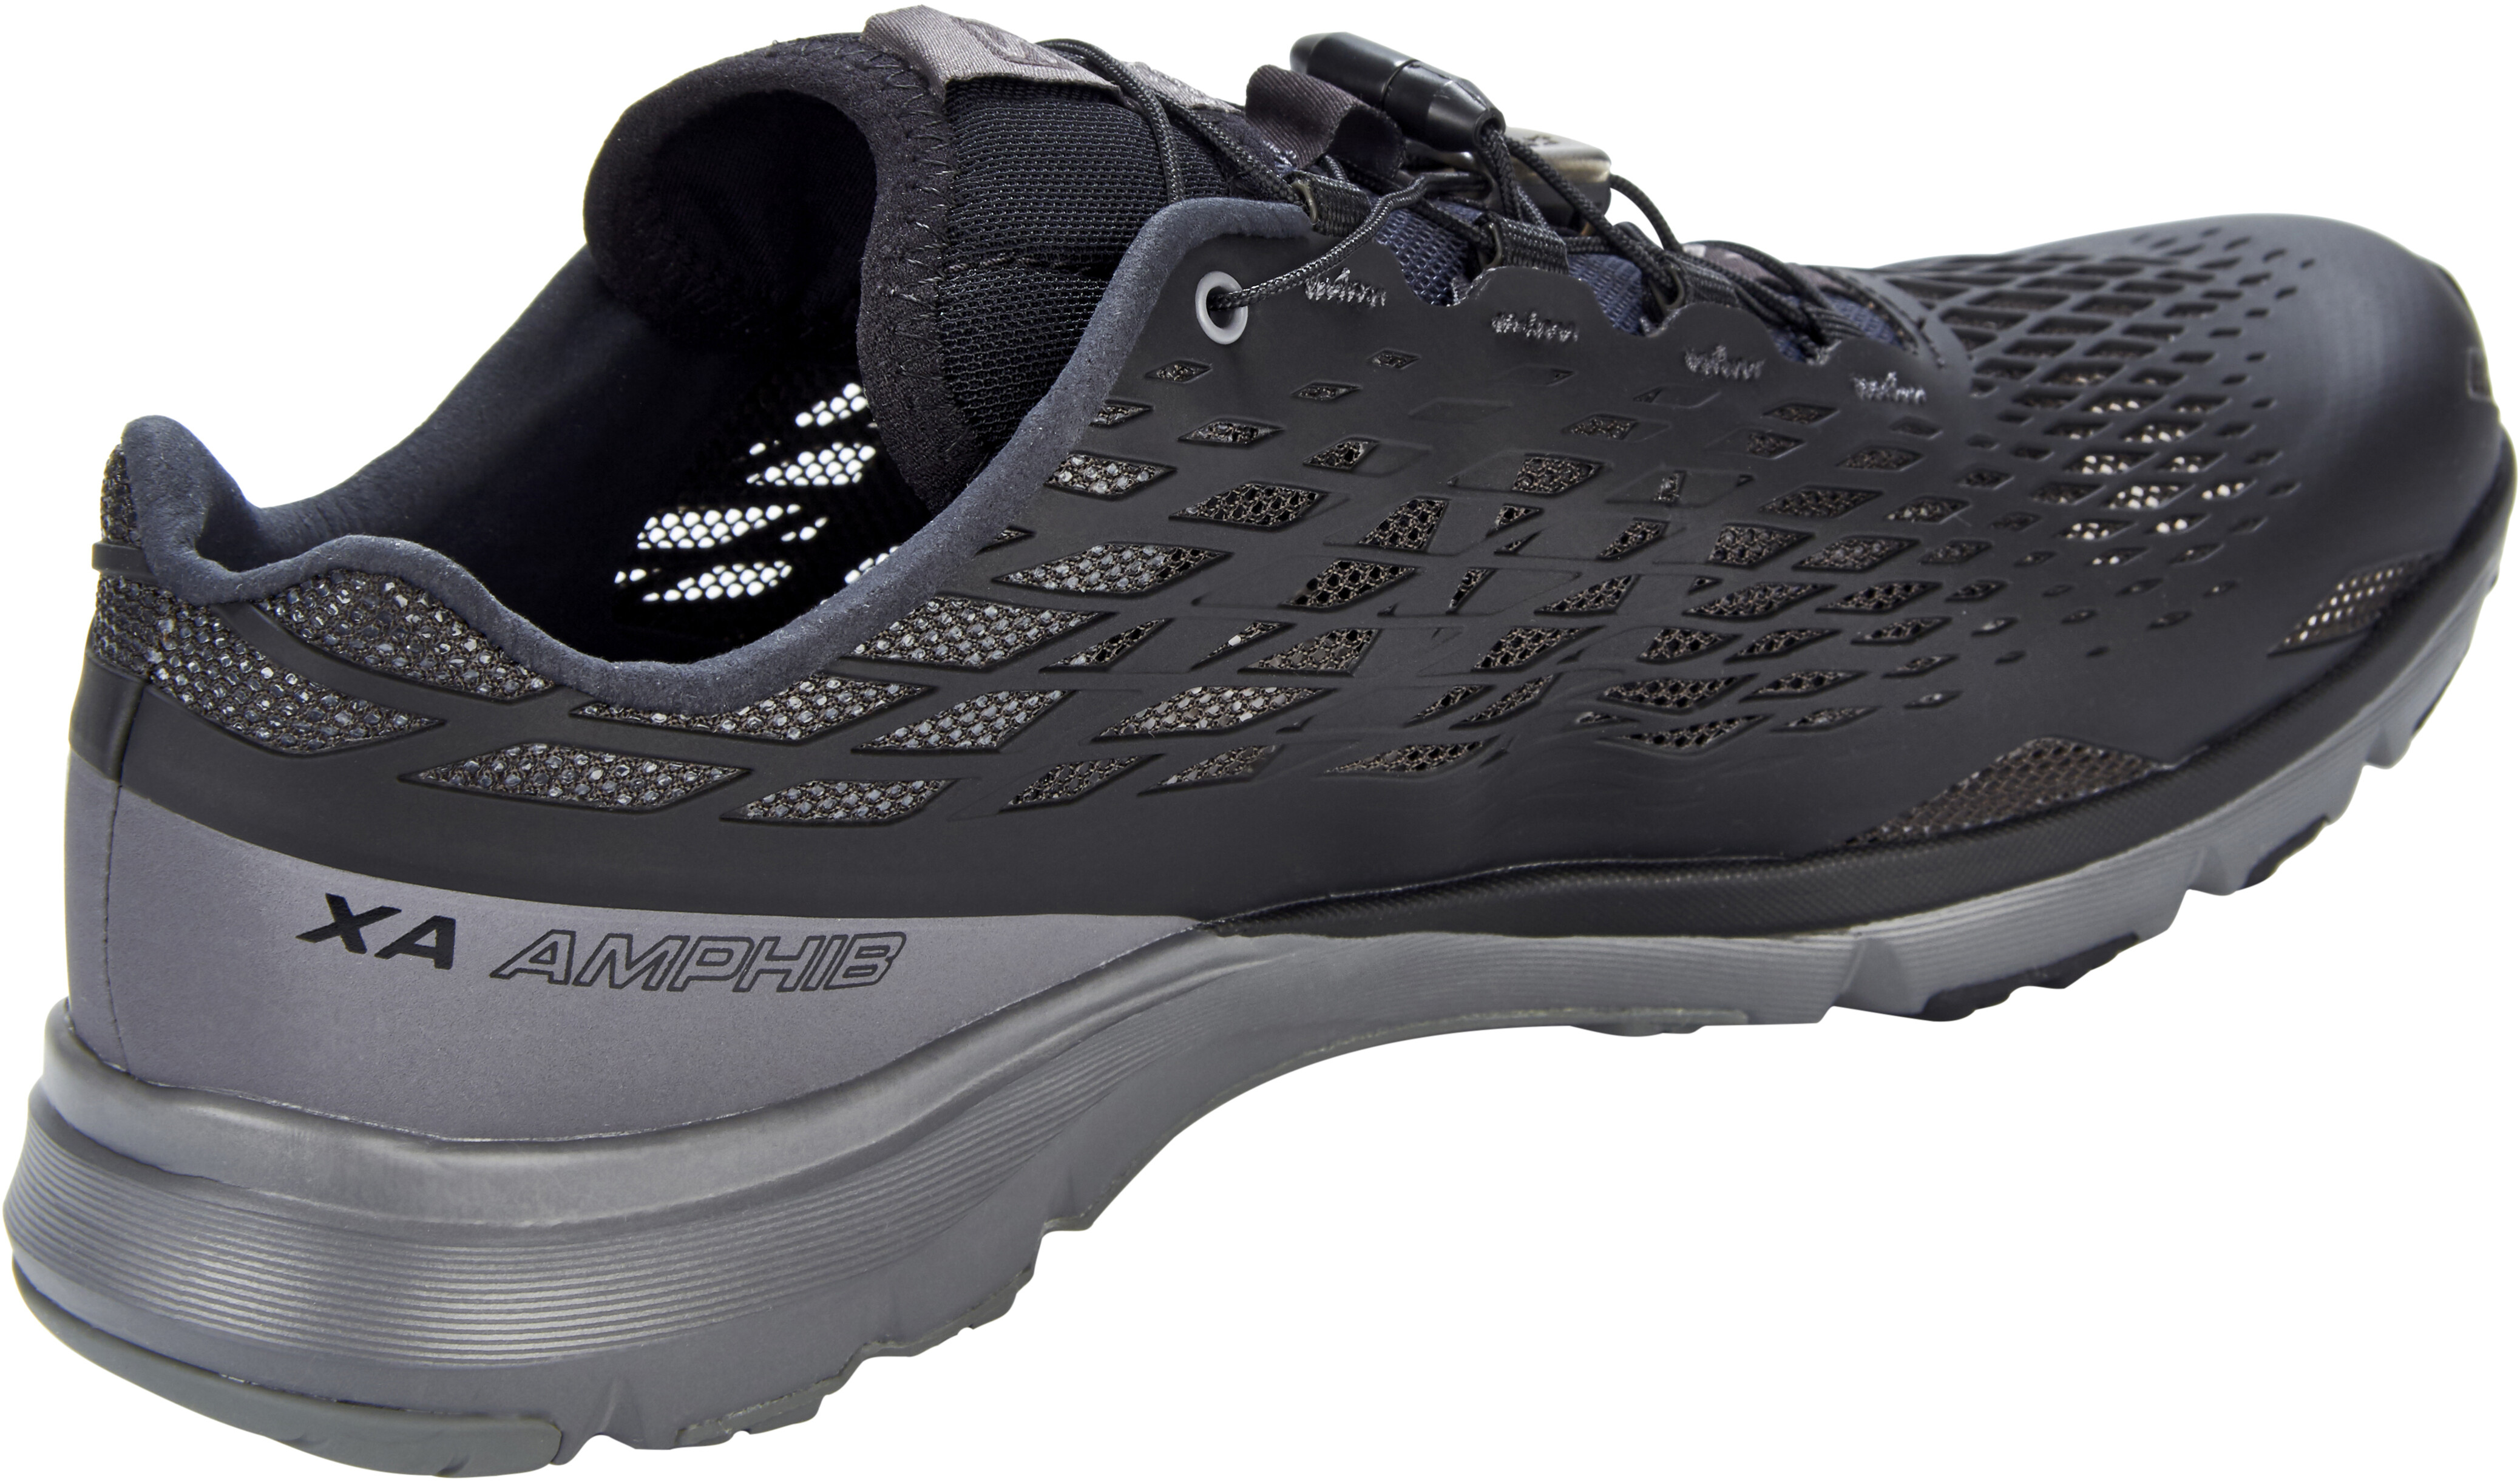 d6fd64d58bff Salomon M s XA Amphib Shoes Phantom Black Quiet Shade - addnature.com